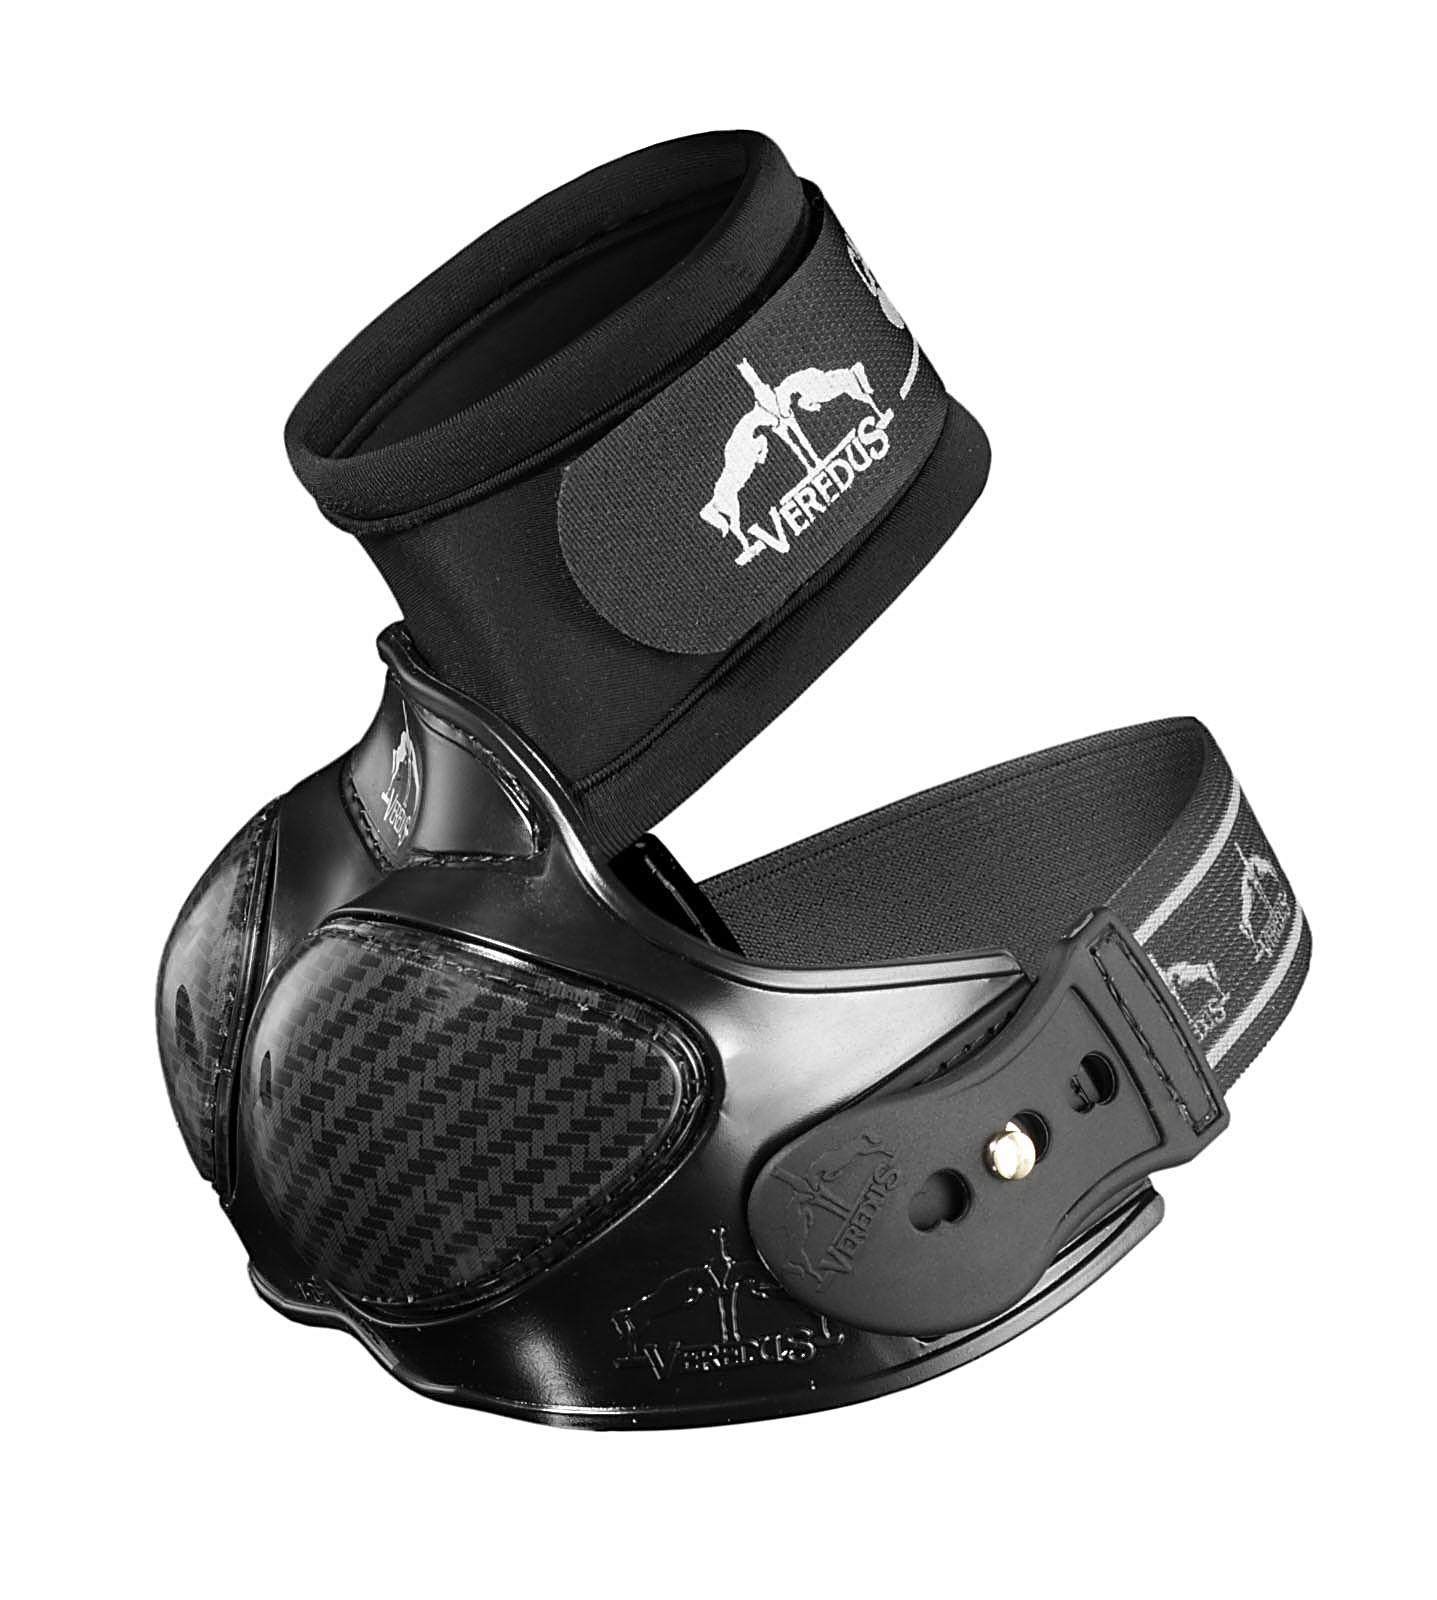 Protetor de Bulbo Shield  VRD  - Salto & Sela